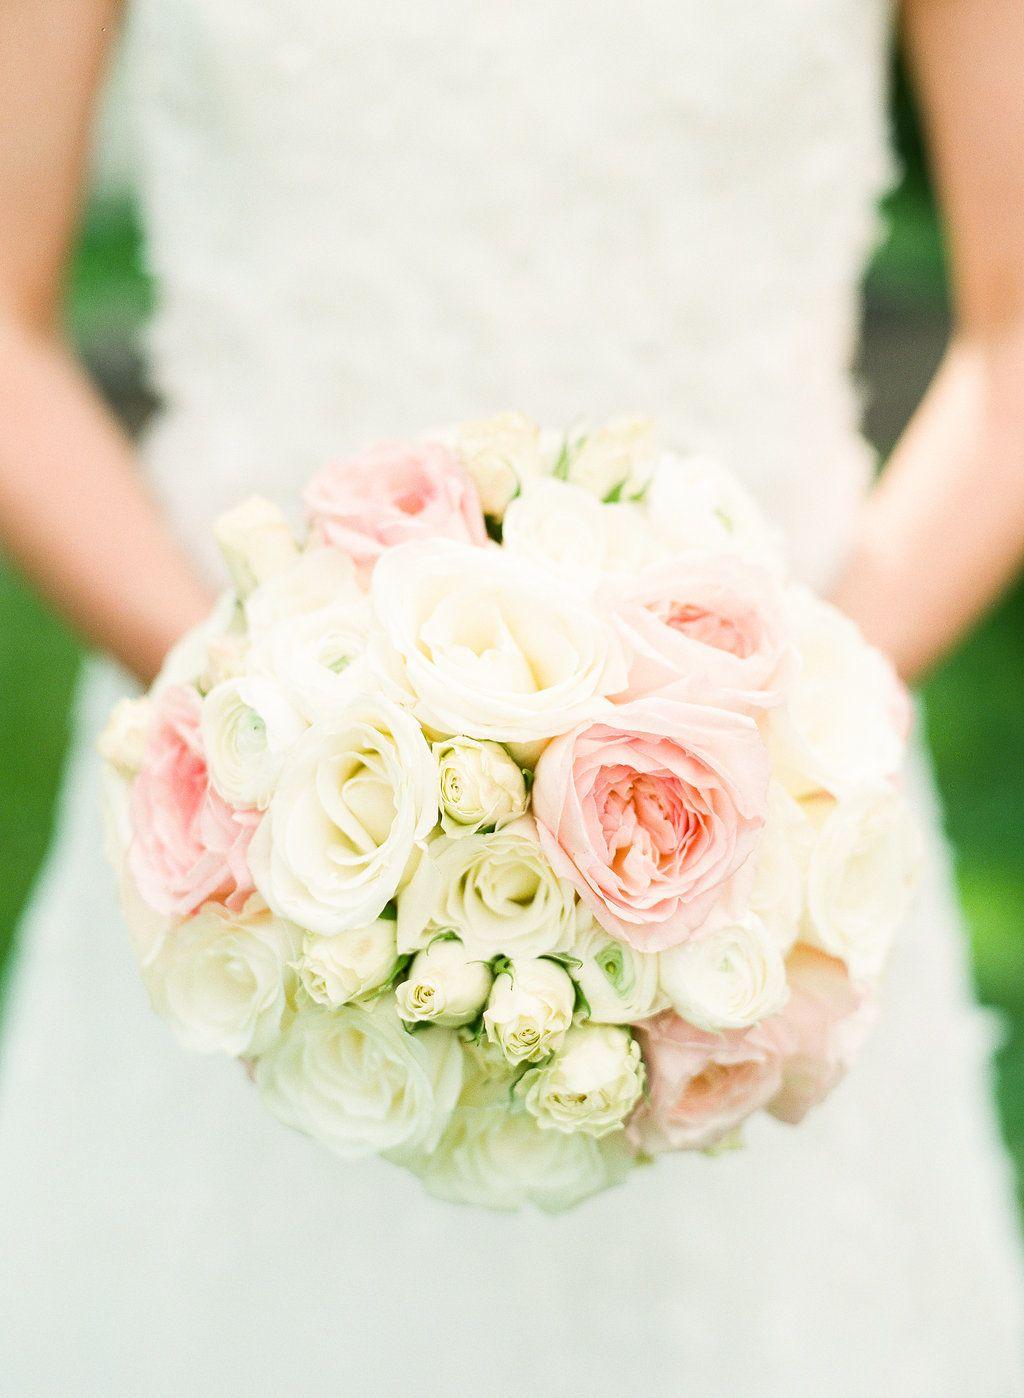 Lauren&Ashley-Wedding-LindsayMaddenPhotographyVII-72 - Village Club of Sands Poin (13)